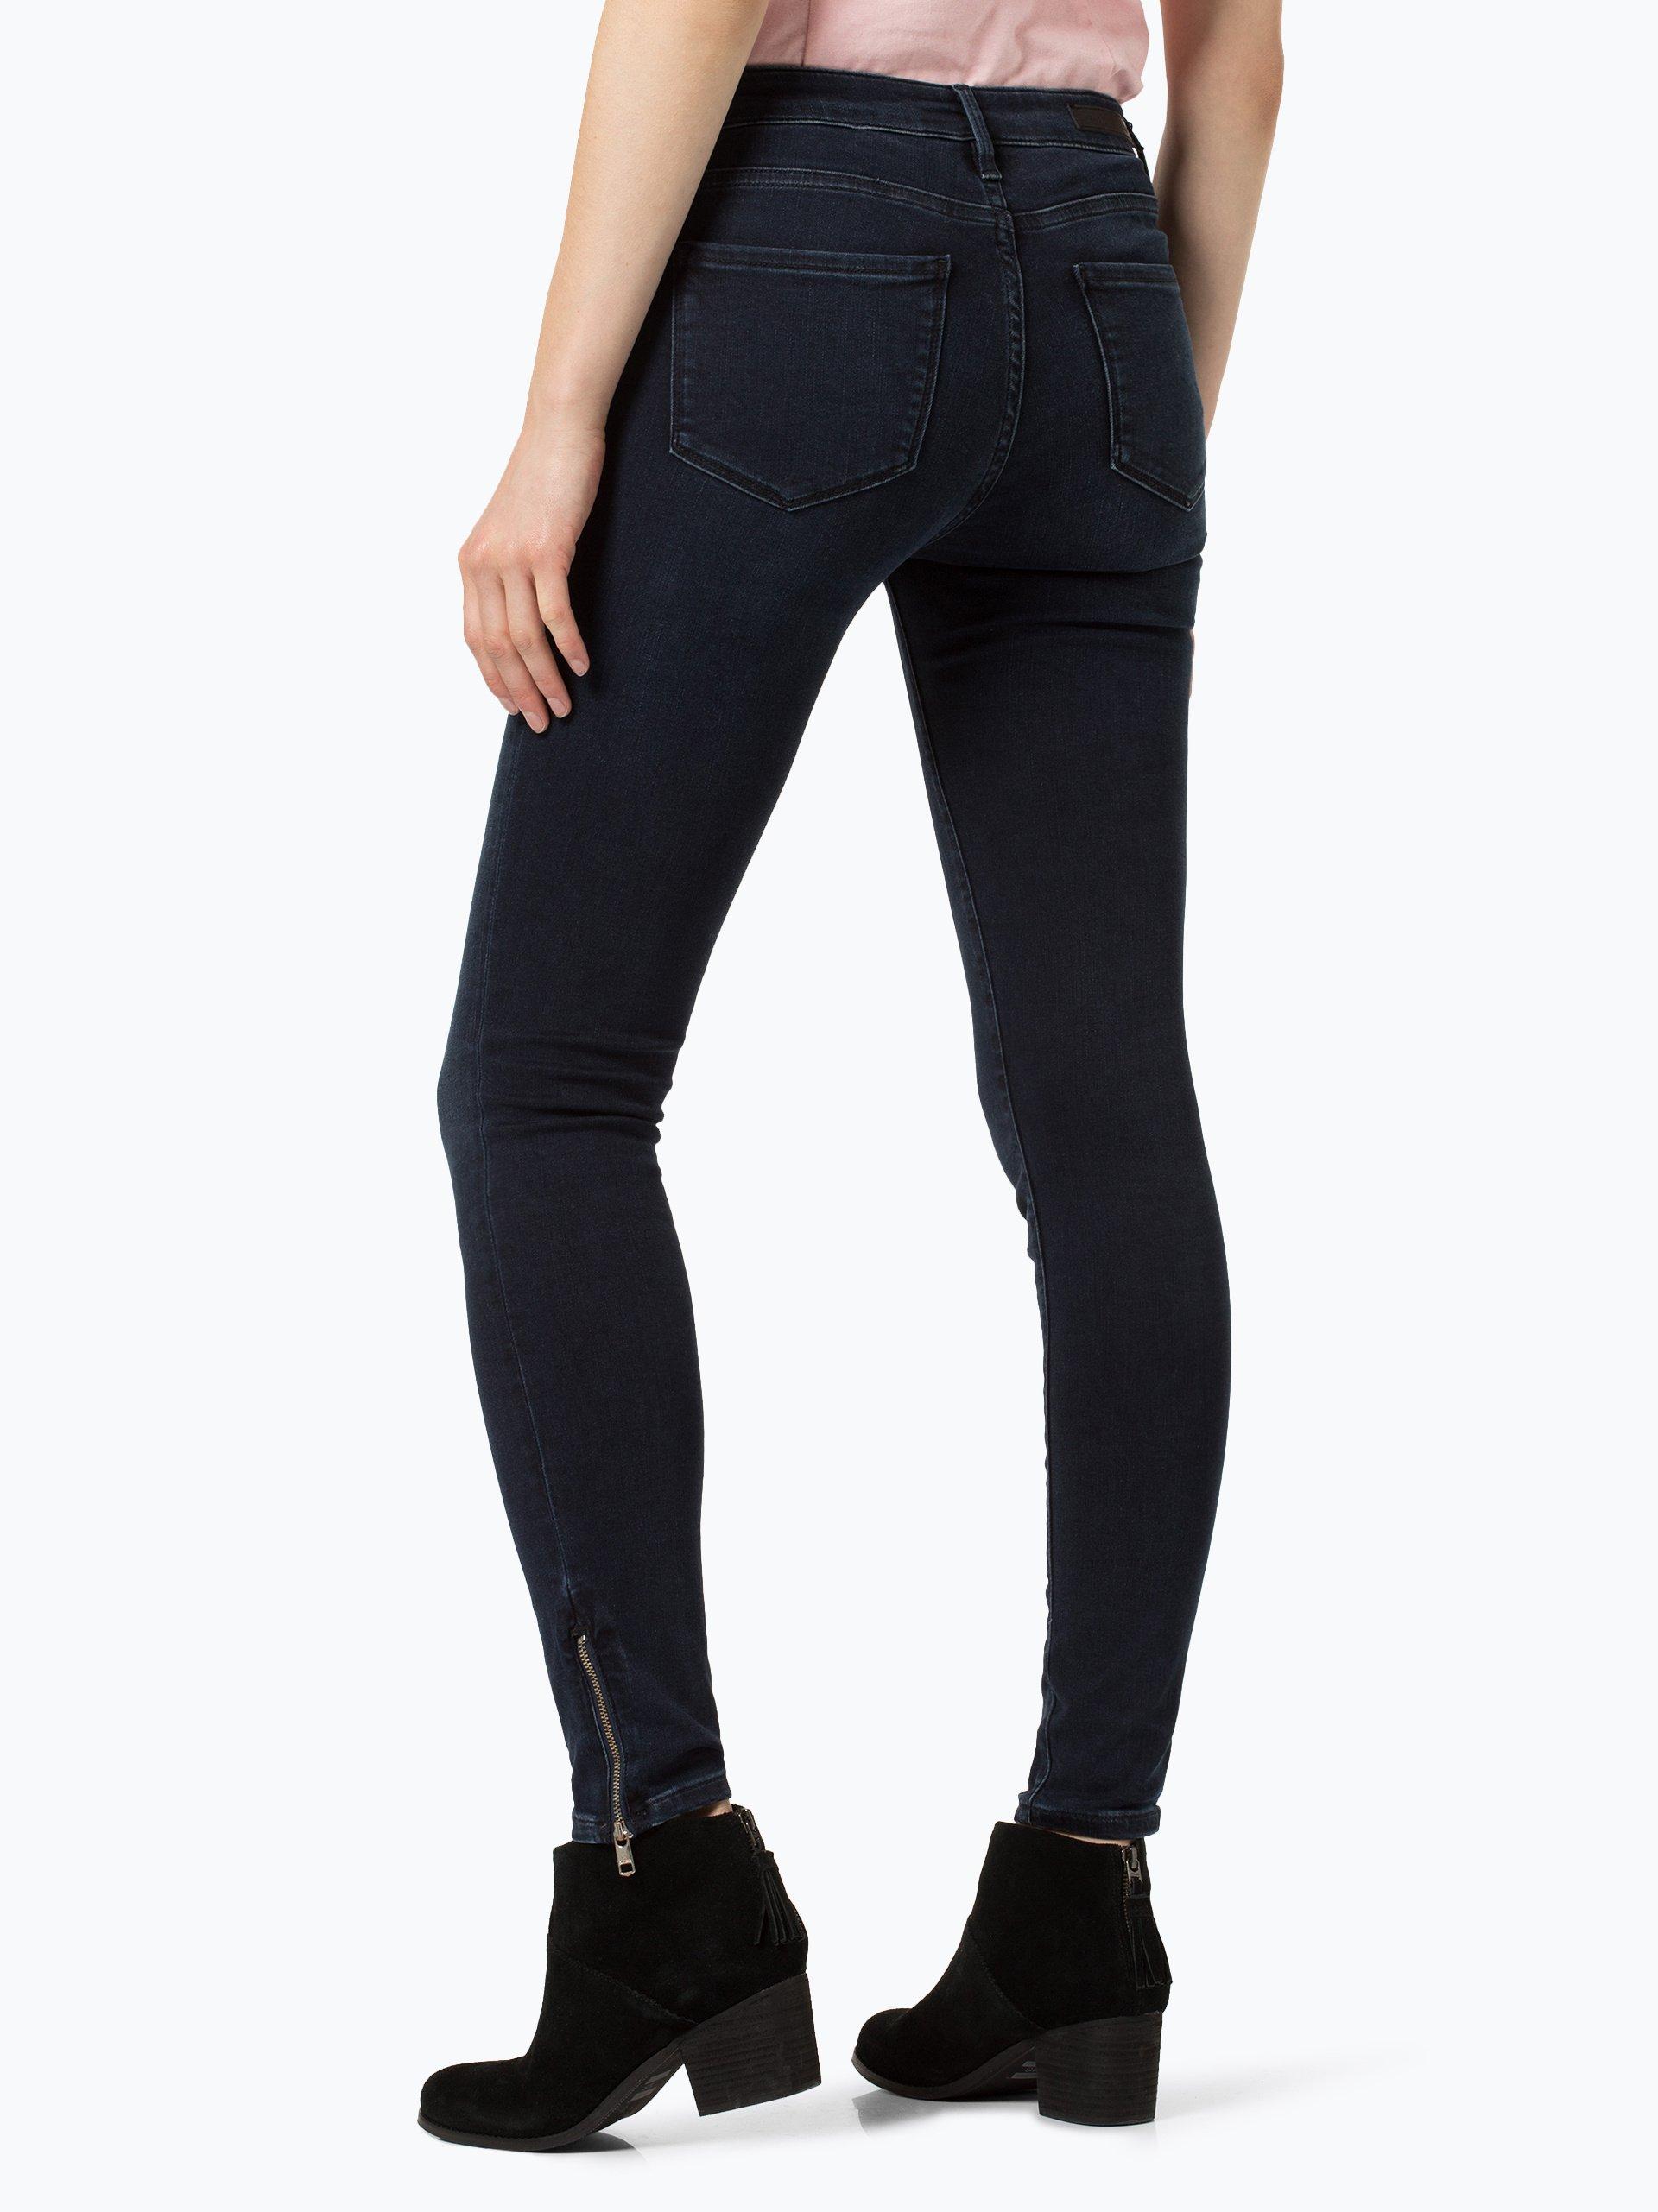 tommy hilfiger damen jeans como f jessie online kaufen. Black Bedroom Furniture Sets. Home Design Ideas